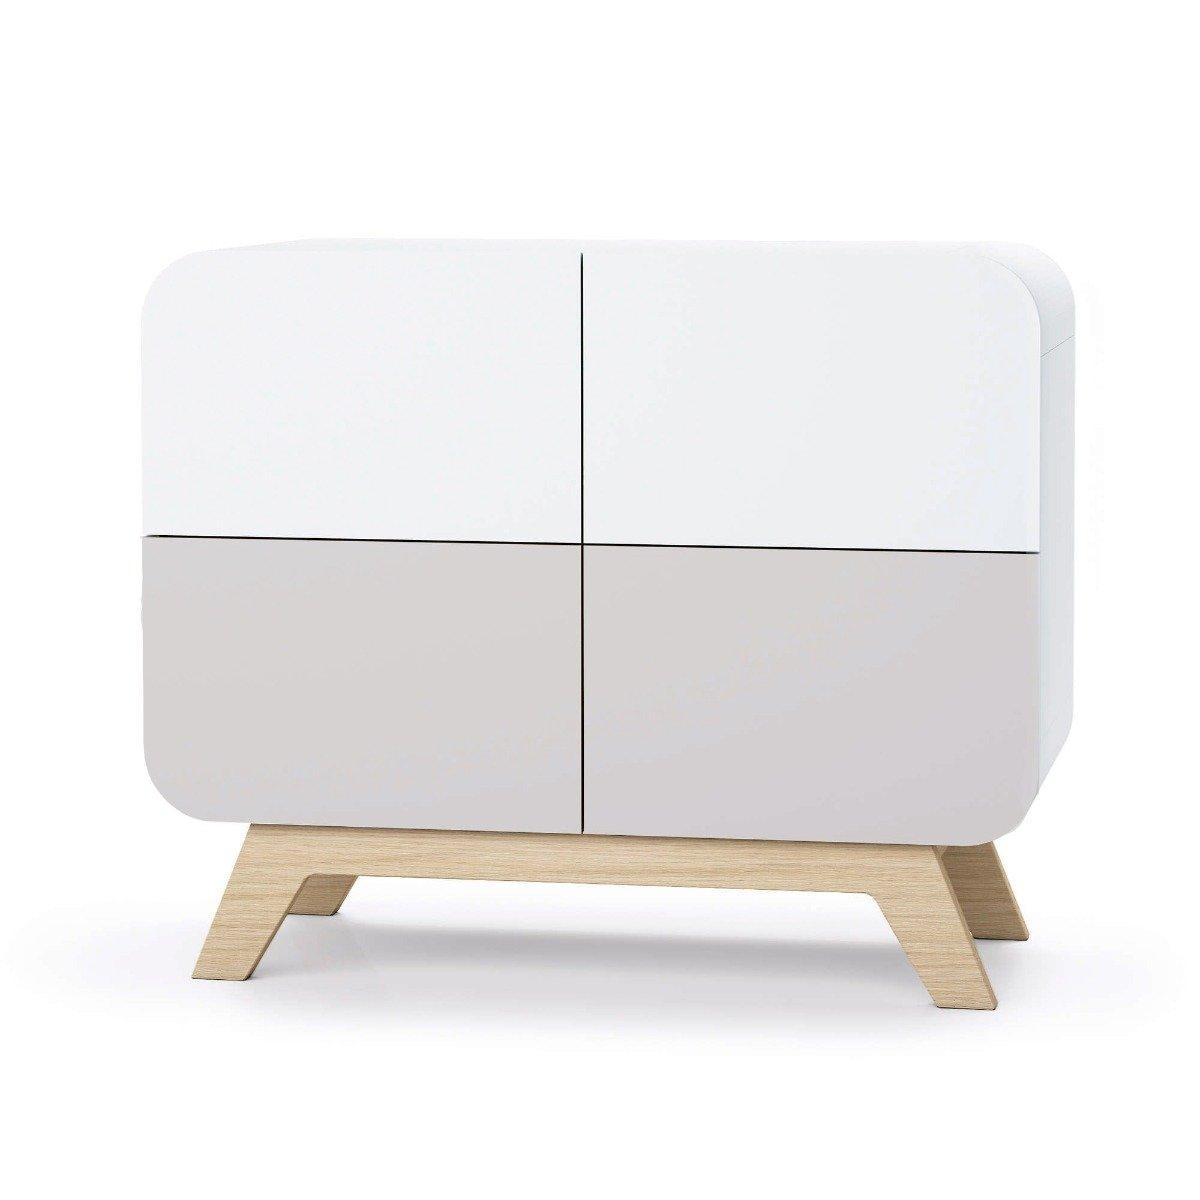 Comoda cu colturi rotunjite Home Concept, Gri imagine